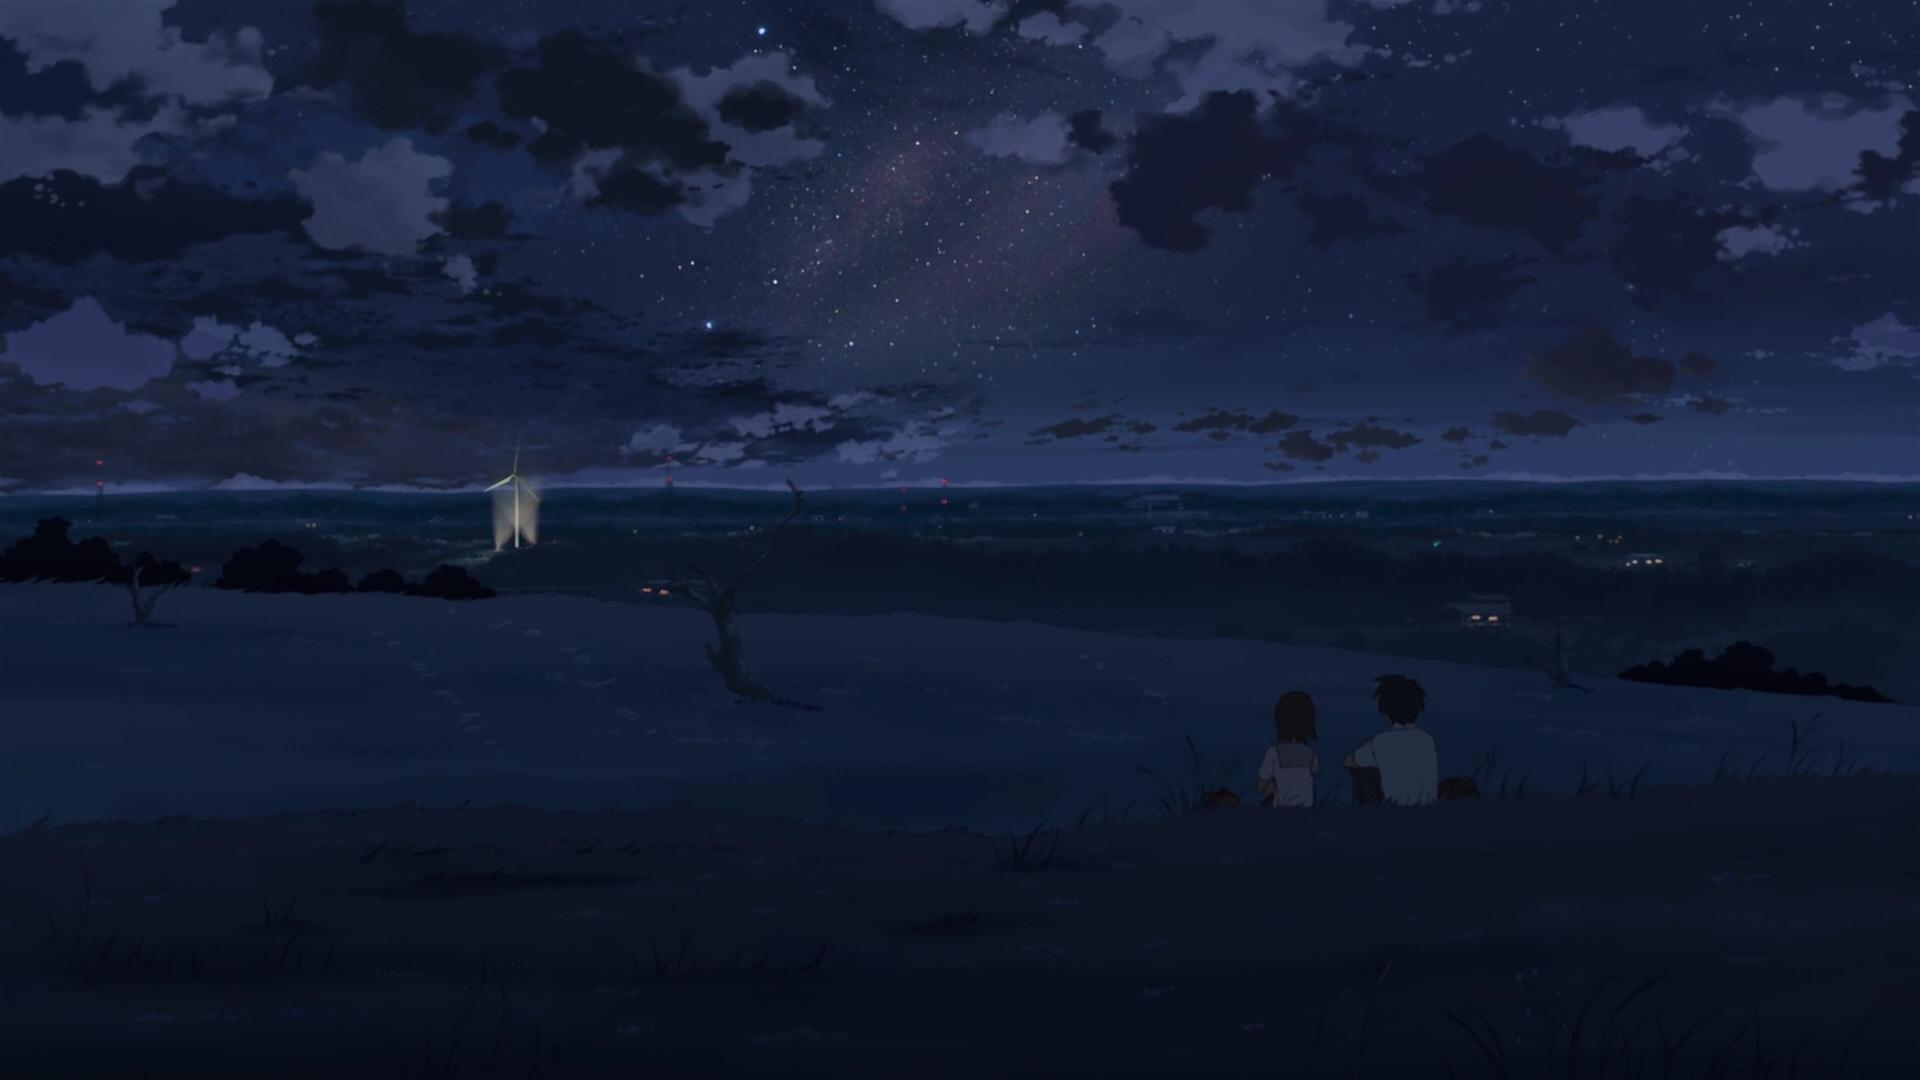 Anime 1920x1080 5 Centimeters Per Second sky anime night stars